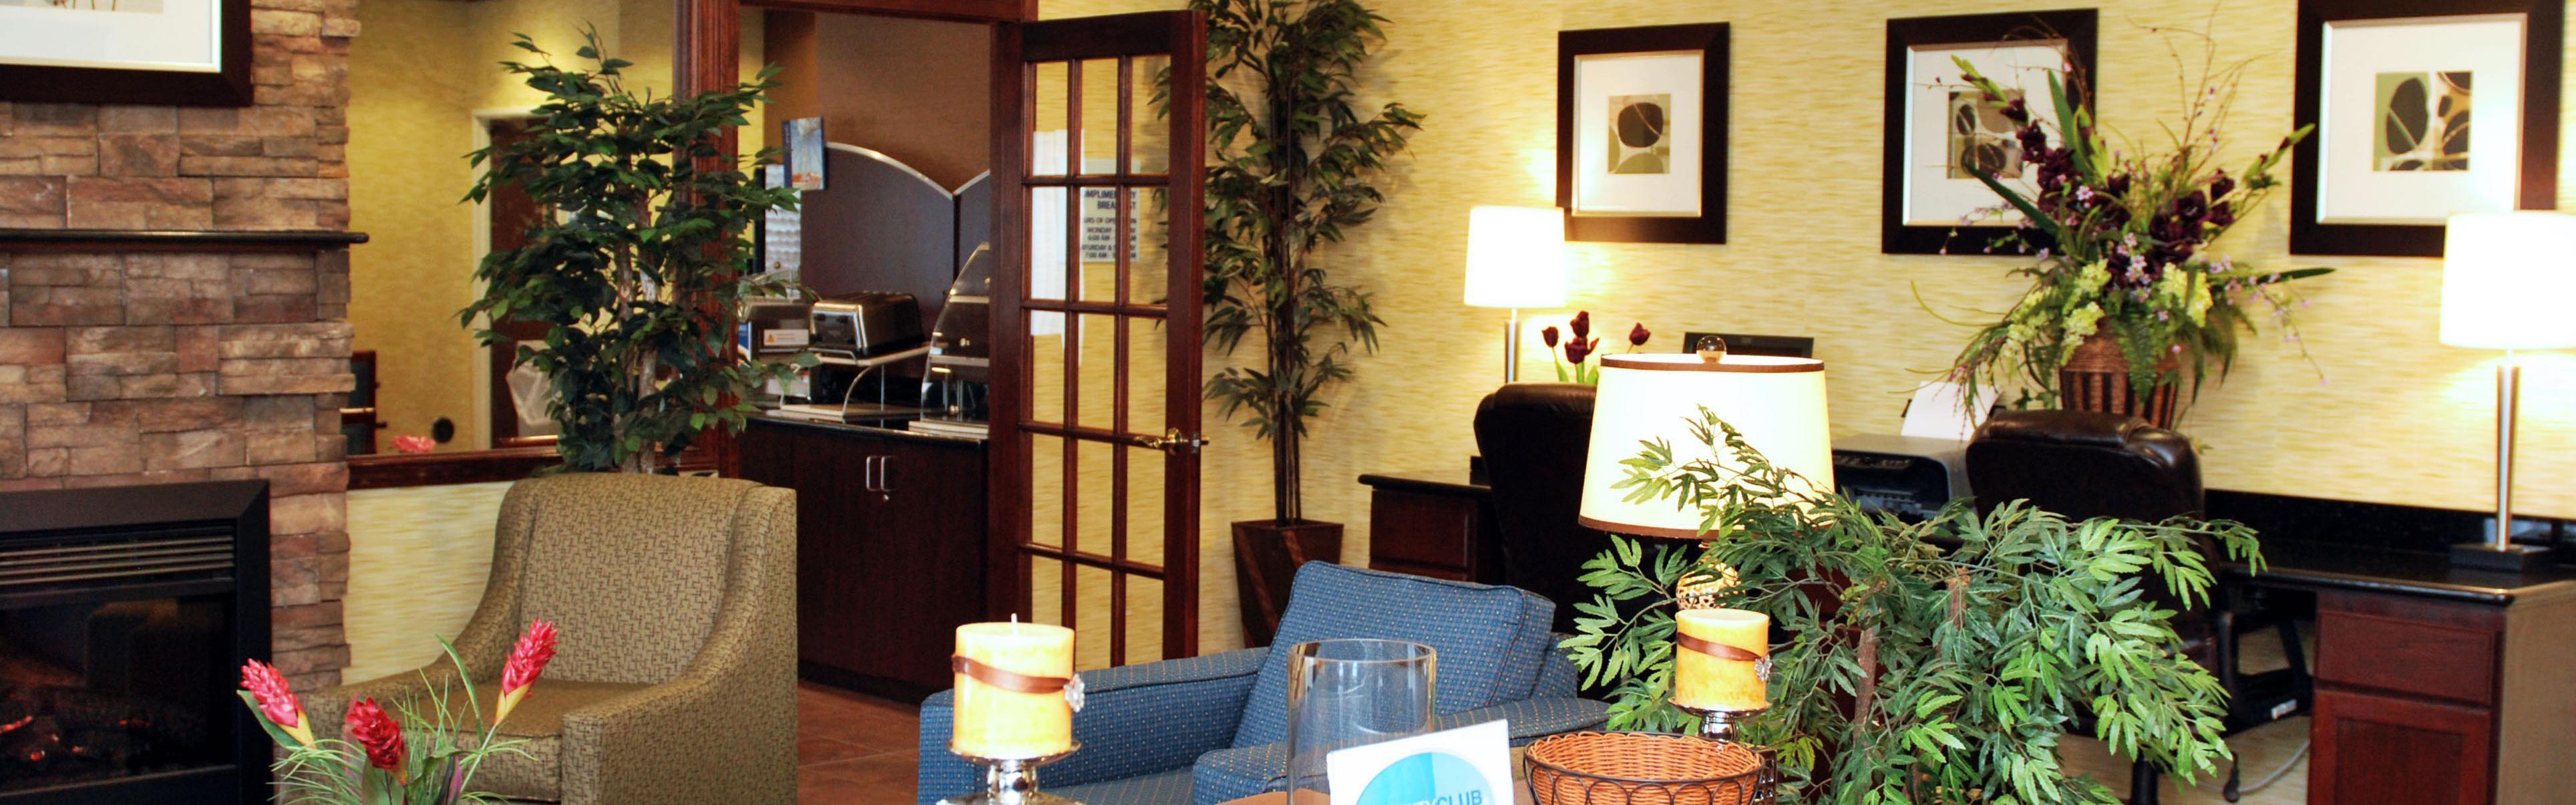 Holiday Inn Express Lapeer image 2